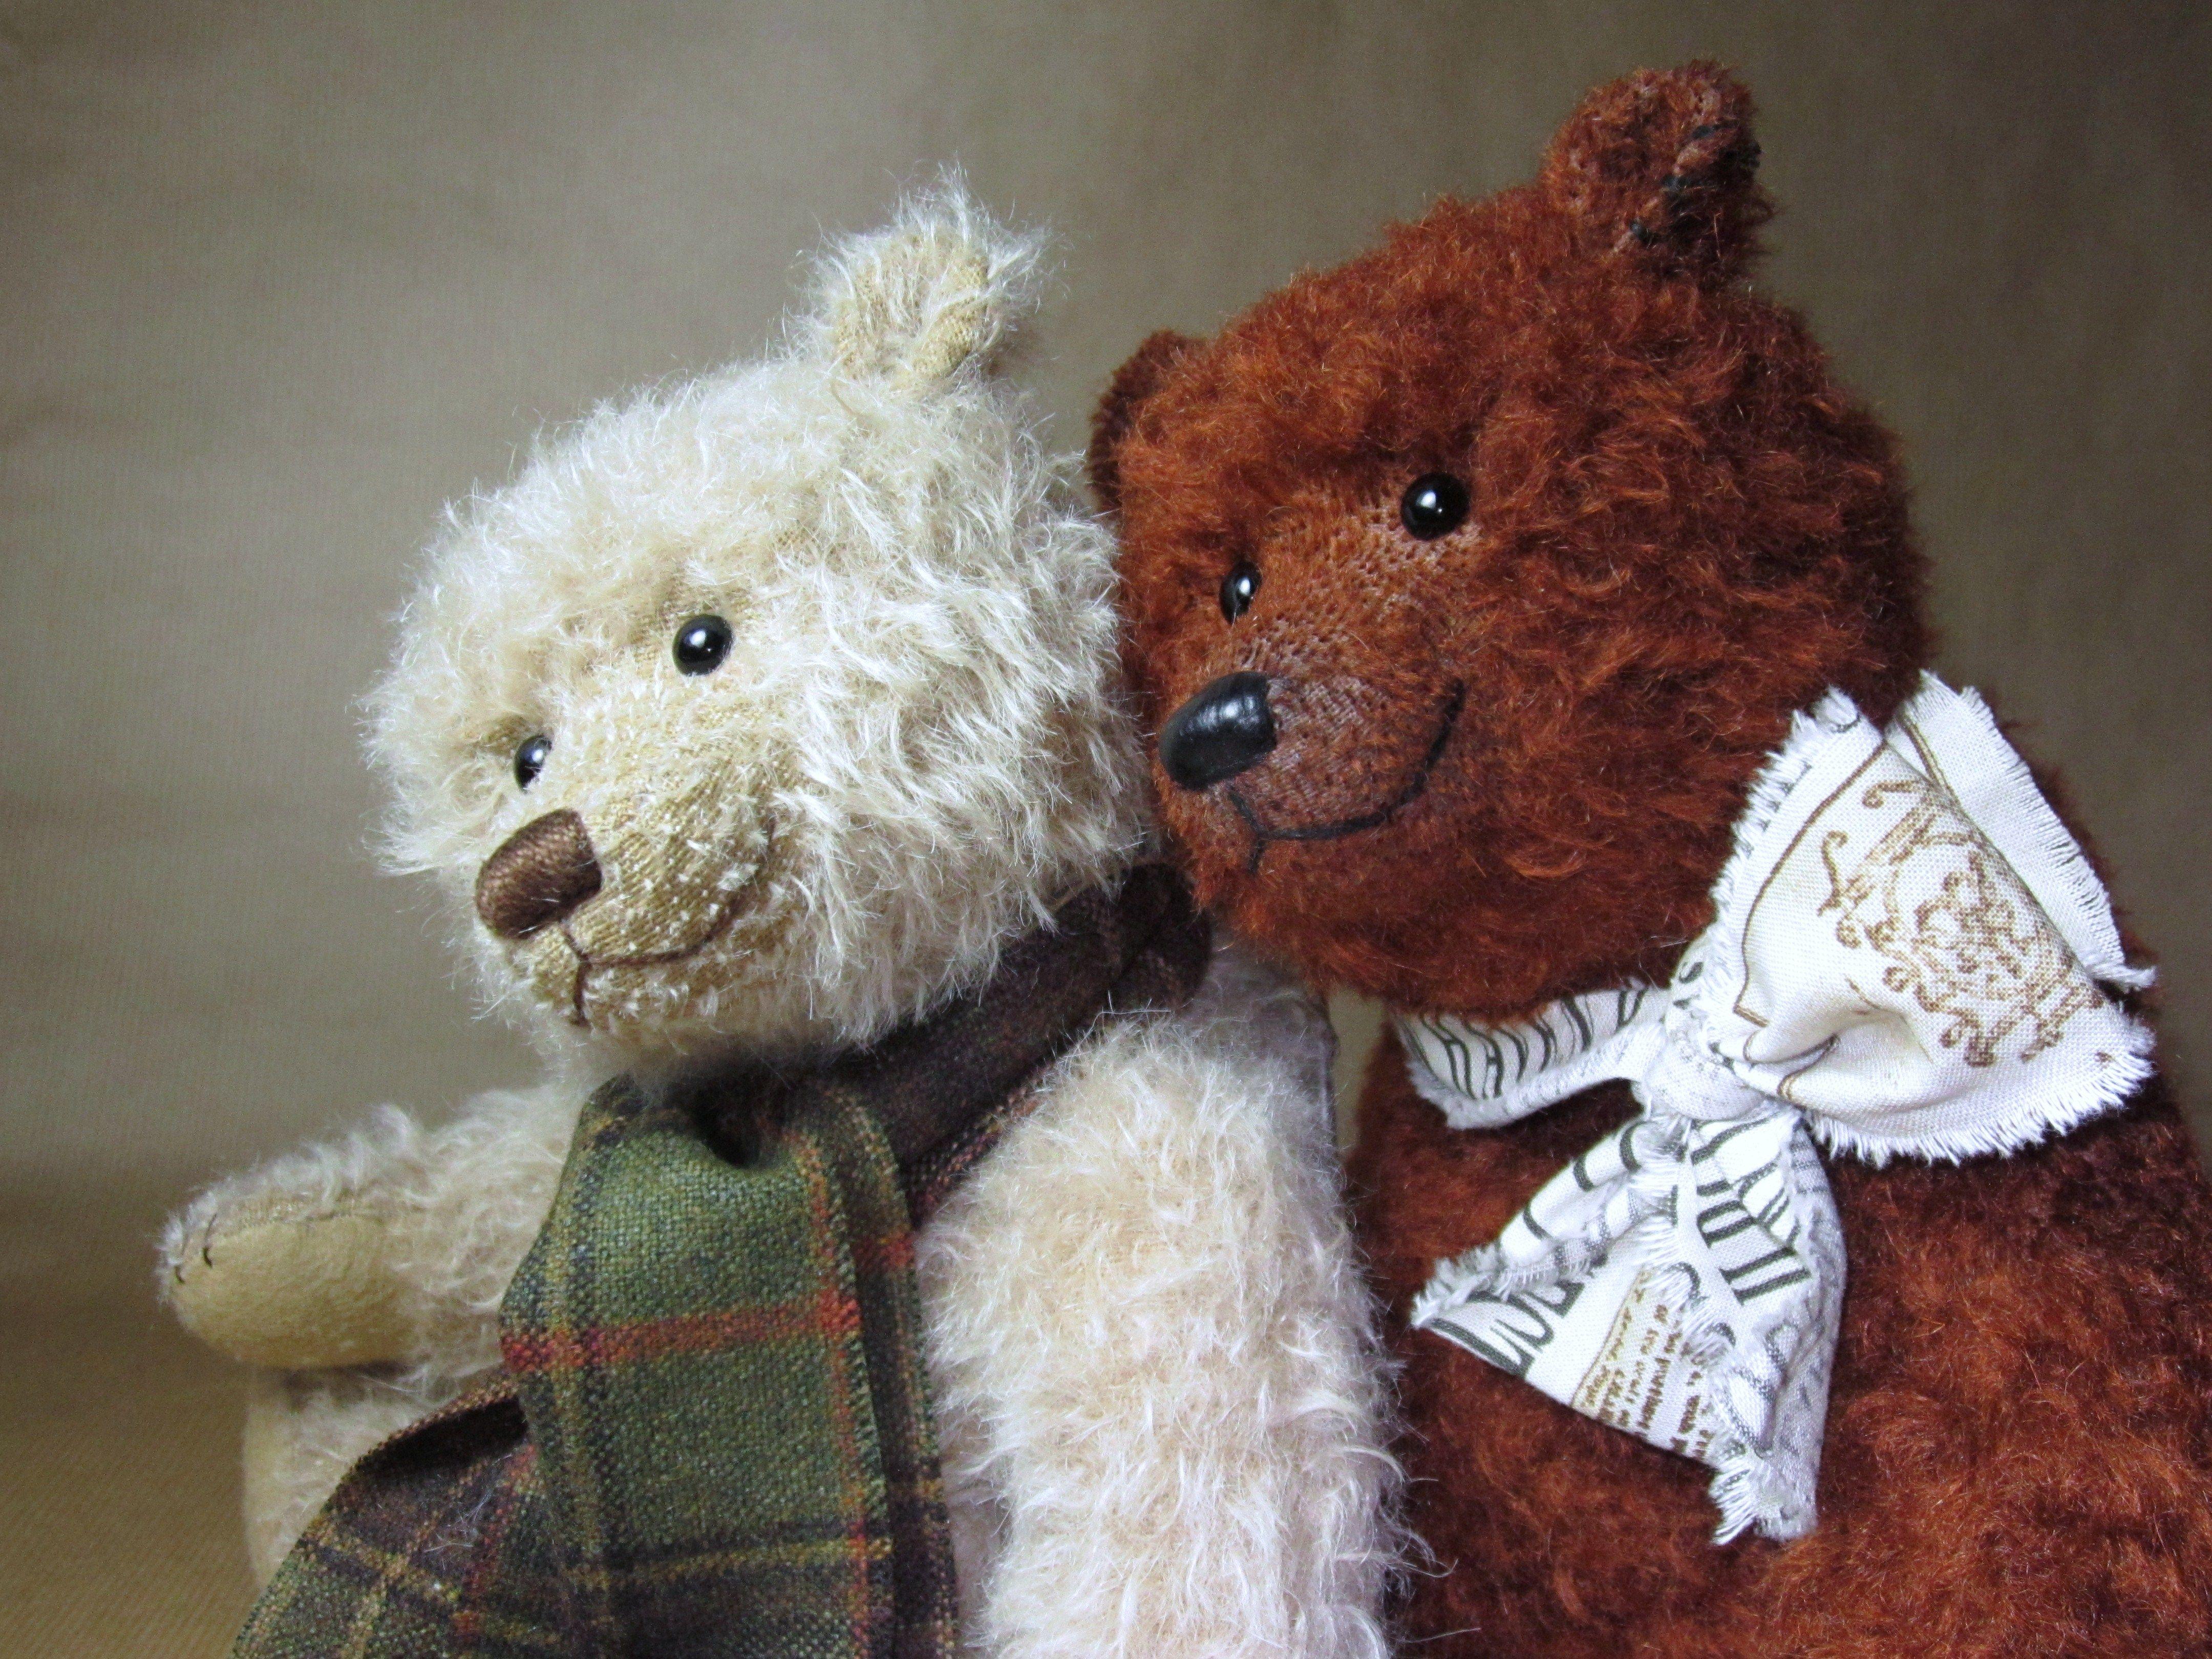 Pin By Pam Cummings On Teddy Bears